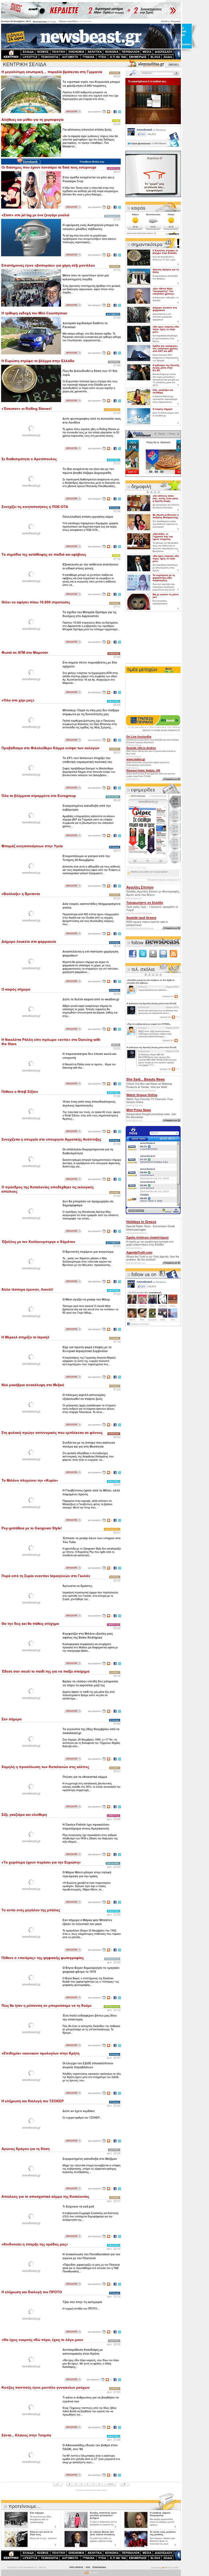 News Beast at Monday Nov. 26, 2012, 6:20 a.m. UTC